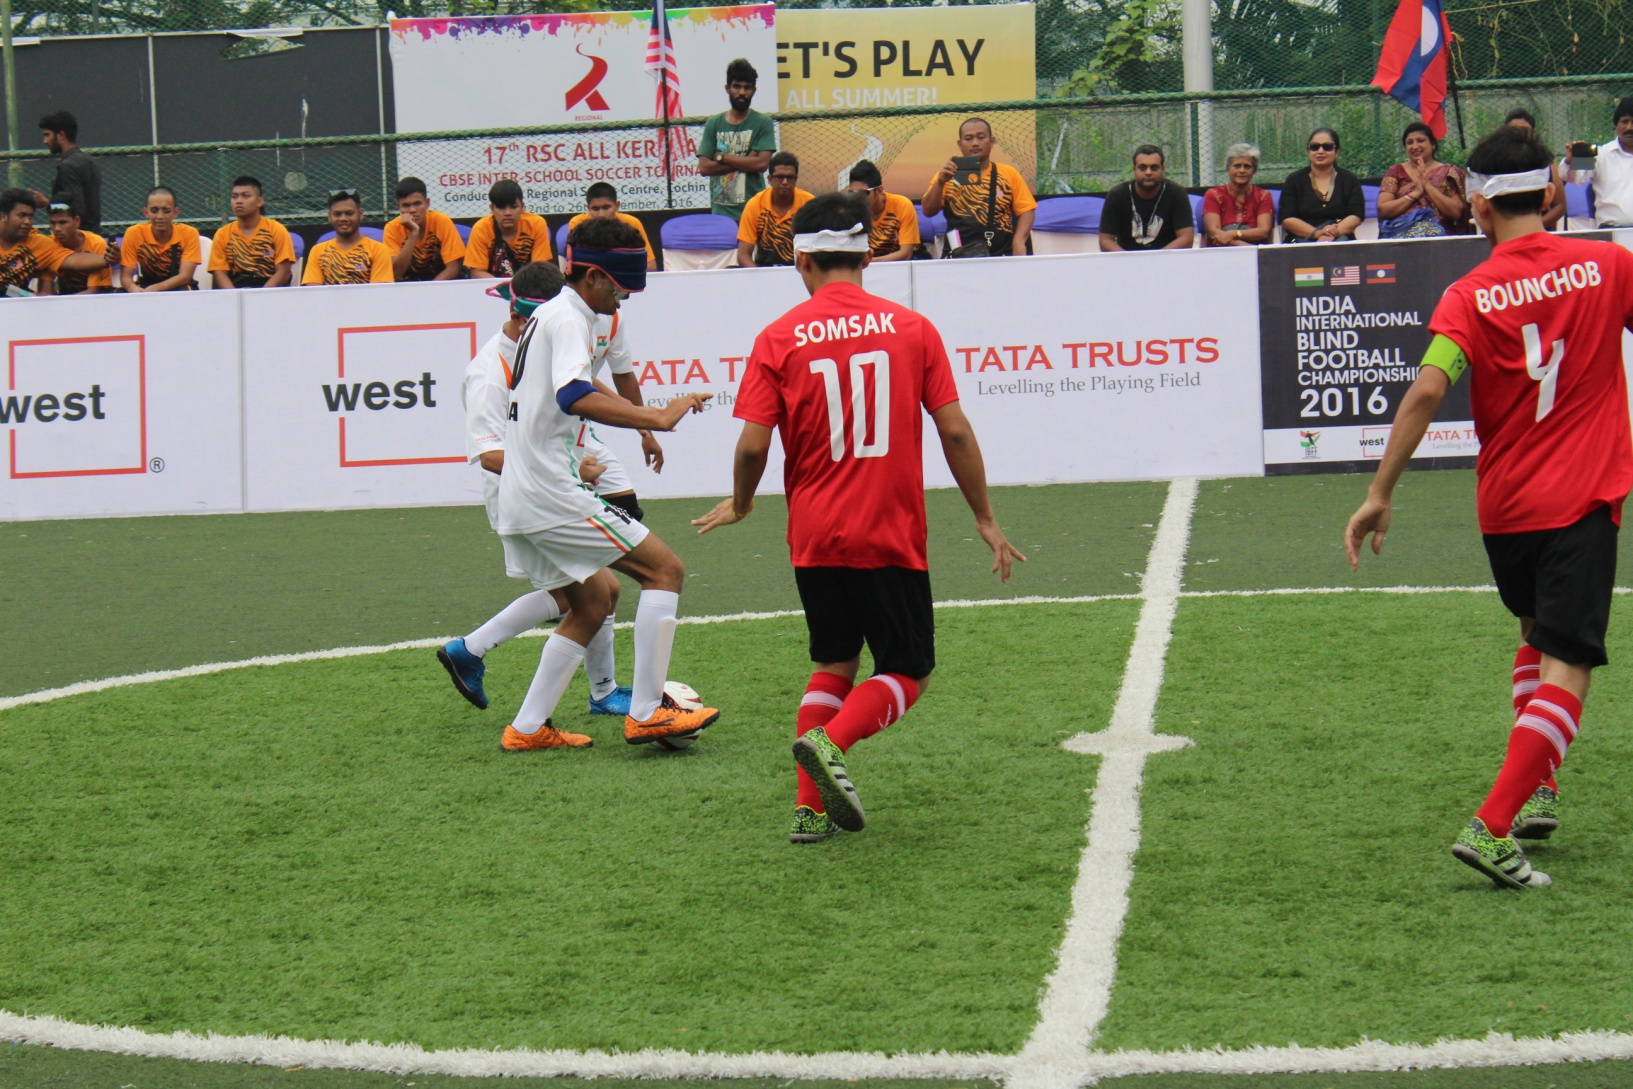 Tackling of players